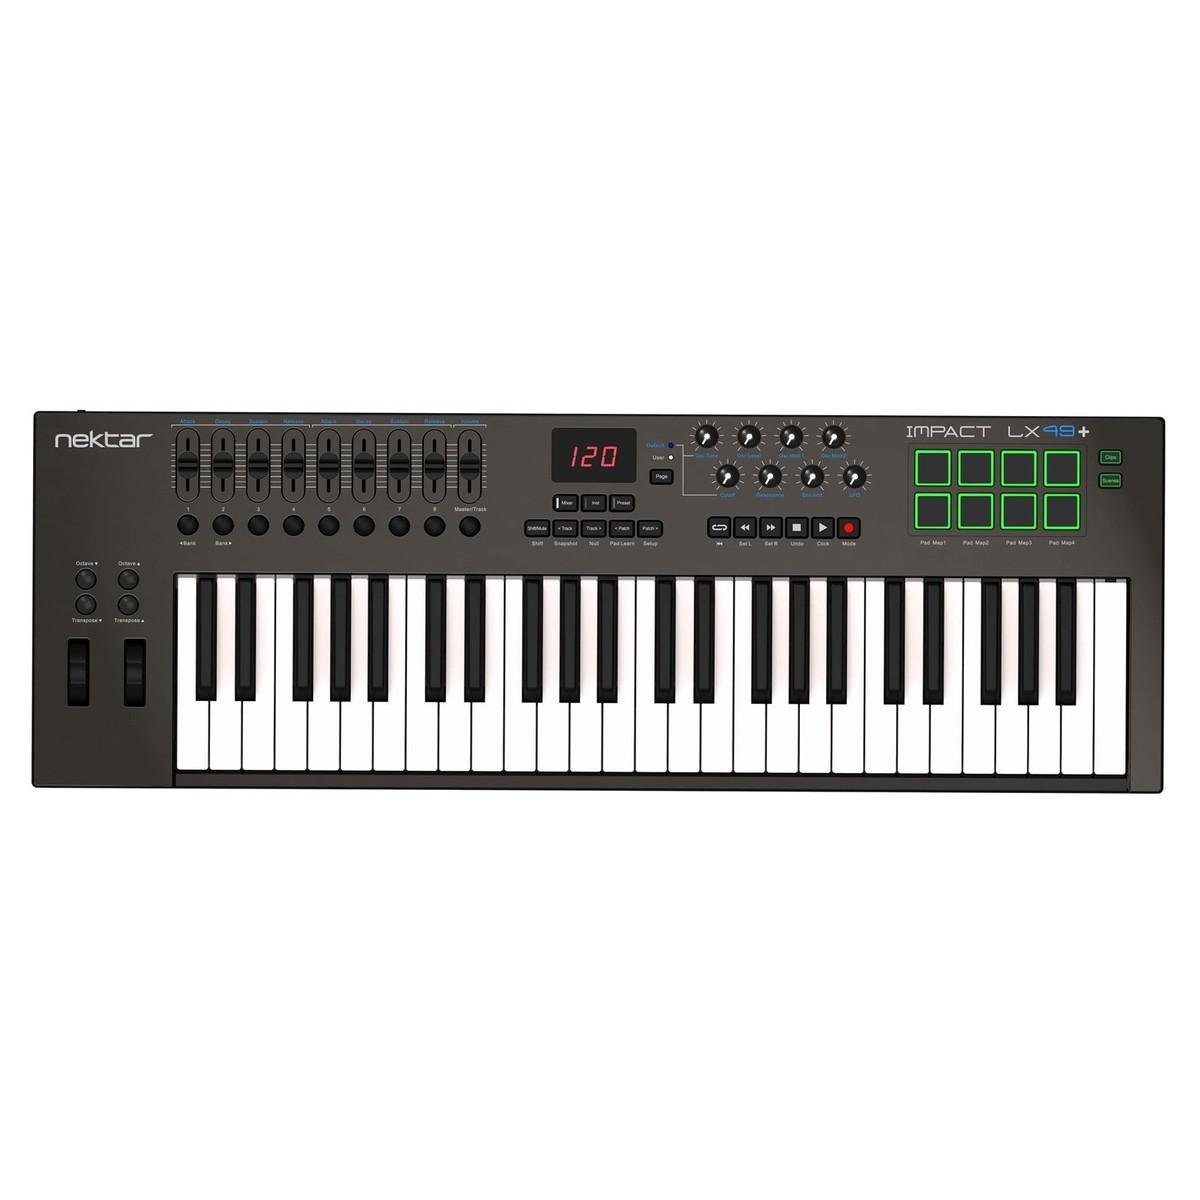 MIDI keyboard / controller - VCV Rack - VCV Community